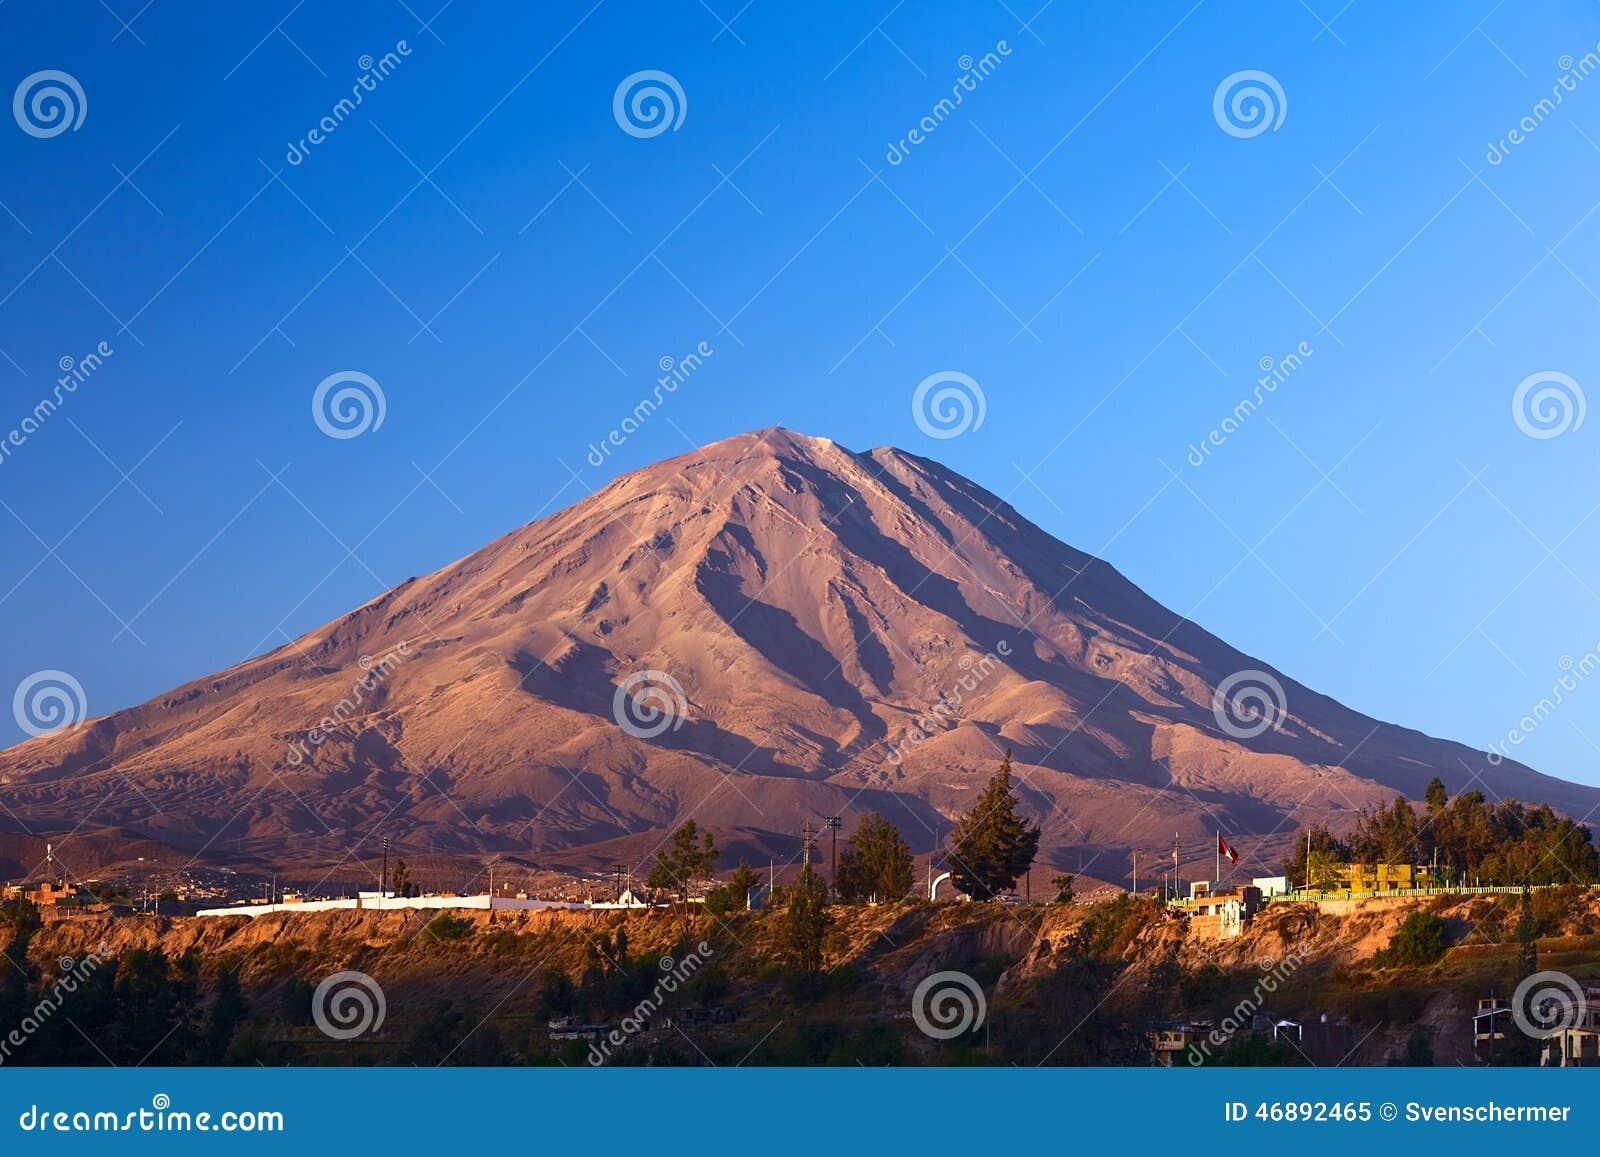 Download Misti Volcano At Arequipa, Peru Stock Image - Image of volcano, symbol: 46892465